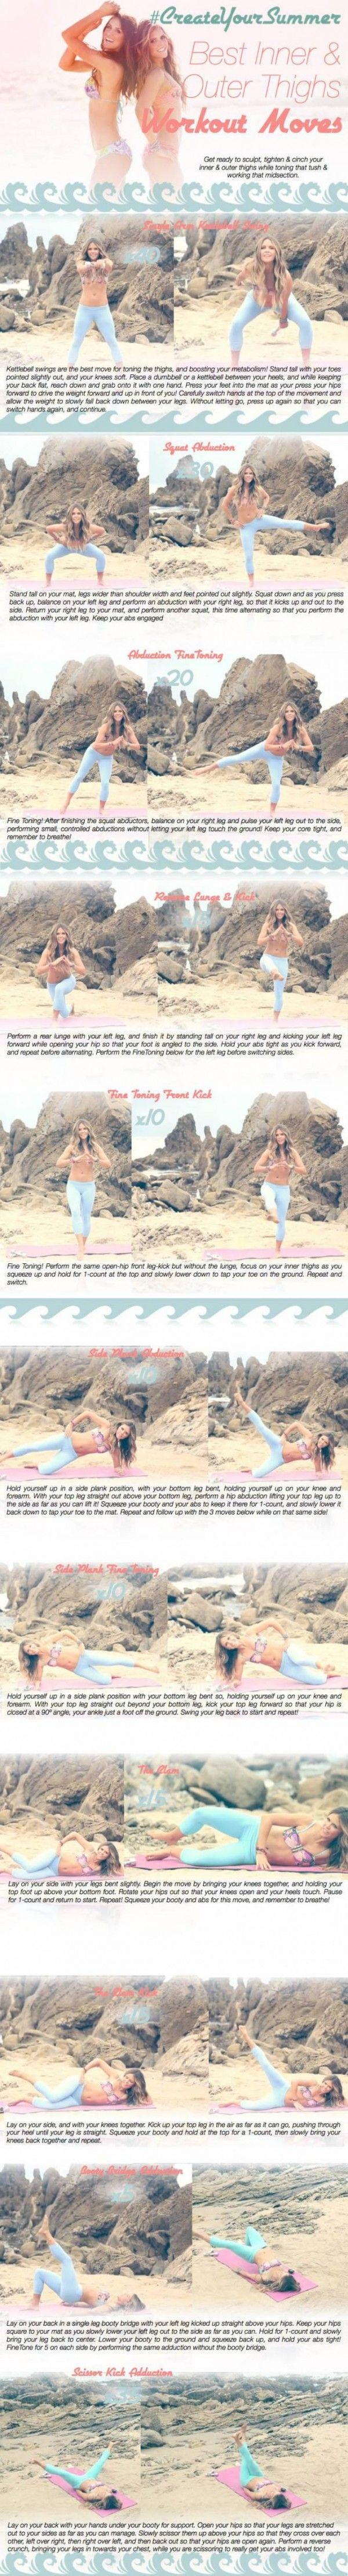 Tone it up bikini series thigh workout fitness pinterest outer